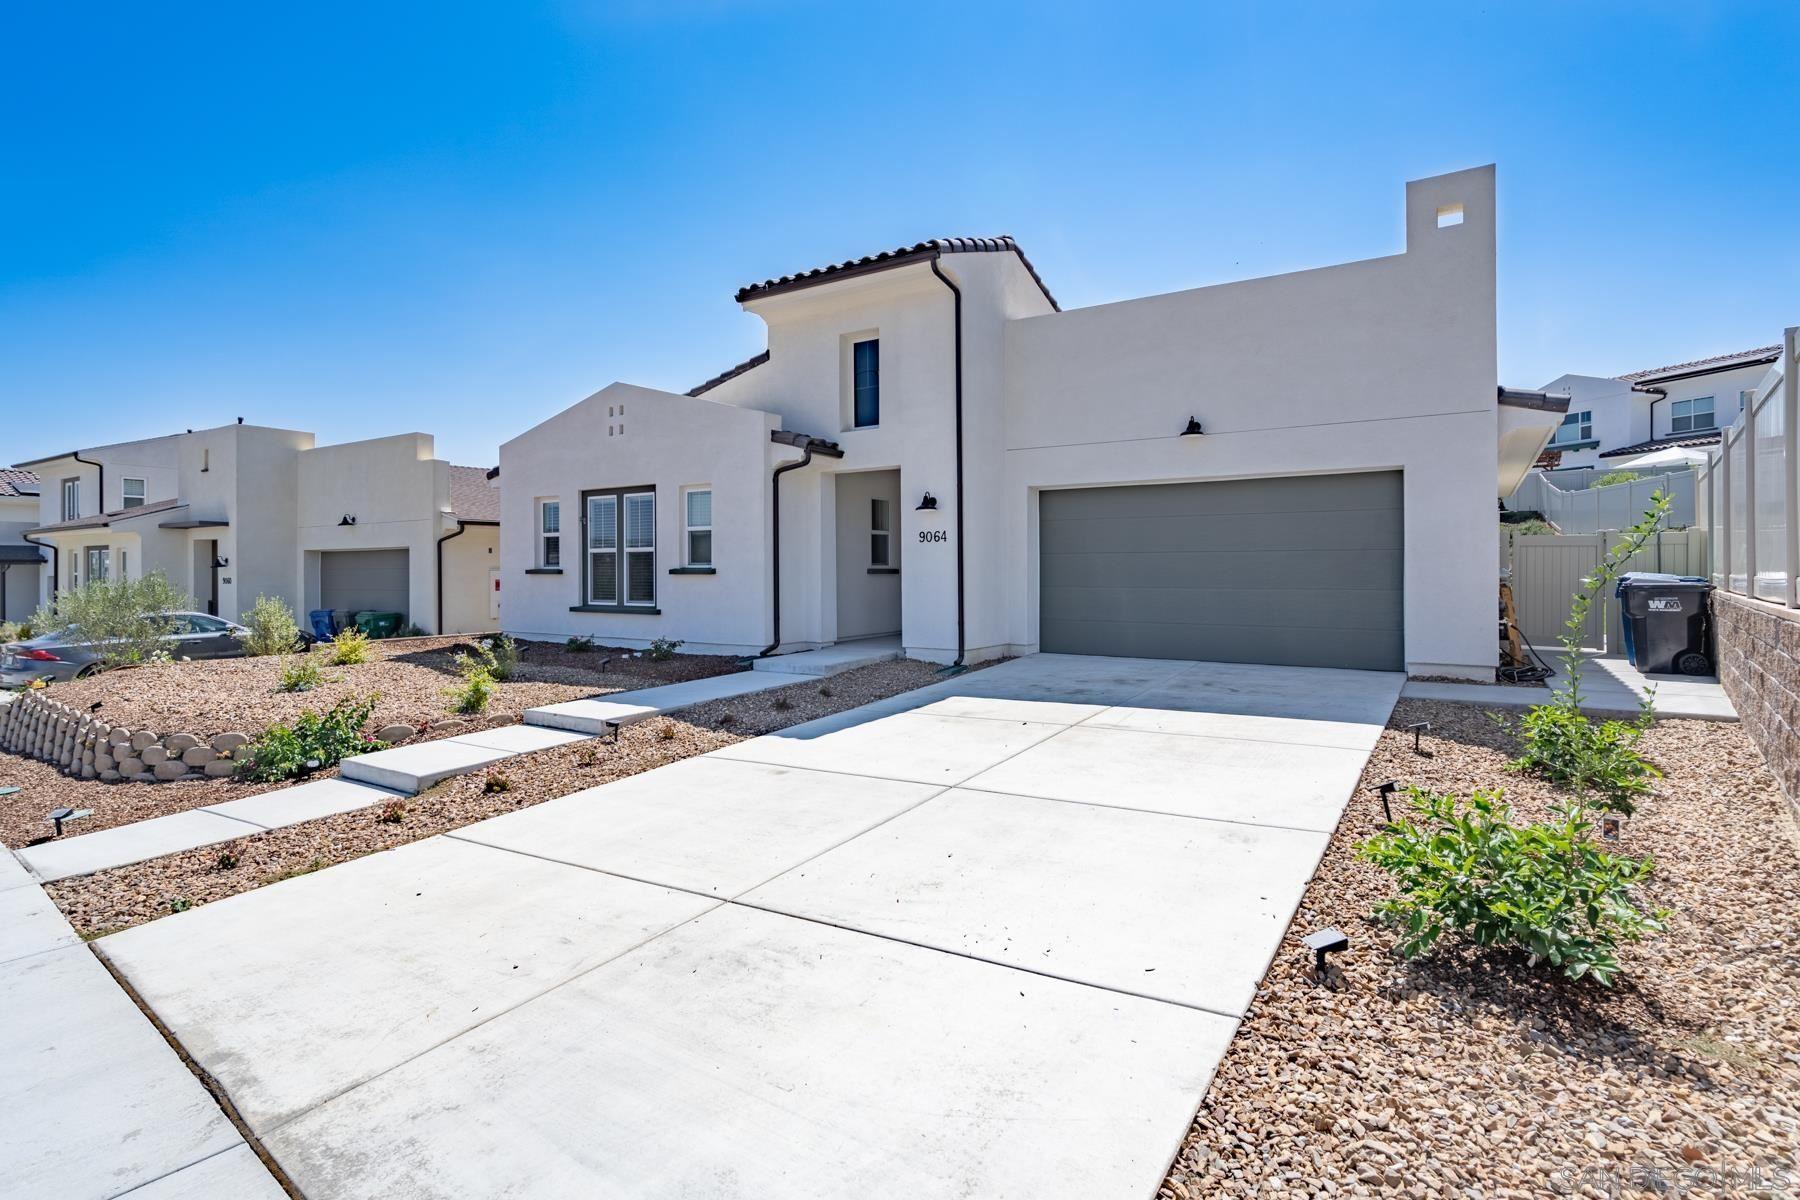 Photo of 9064 Trailridge, Santee, CA 92071 (MLS # 210026444)